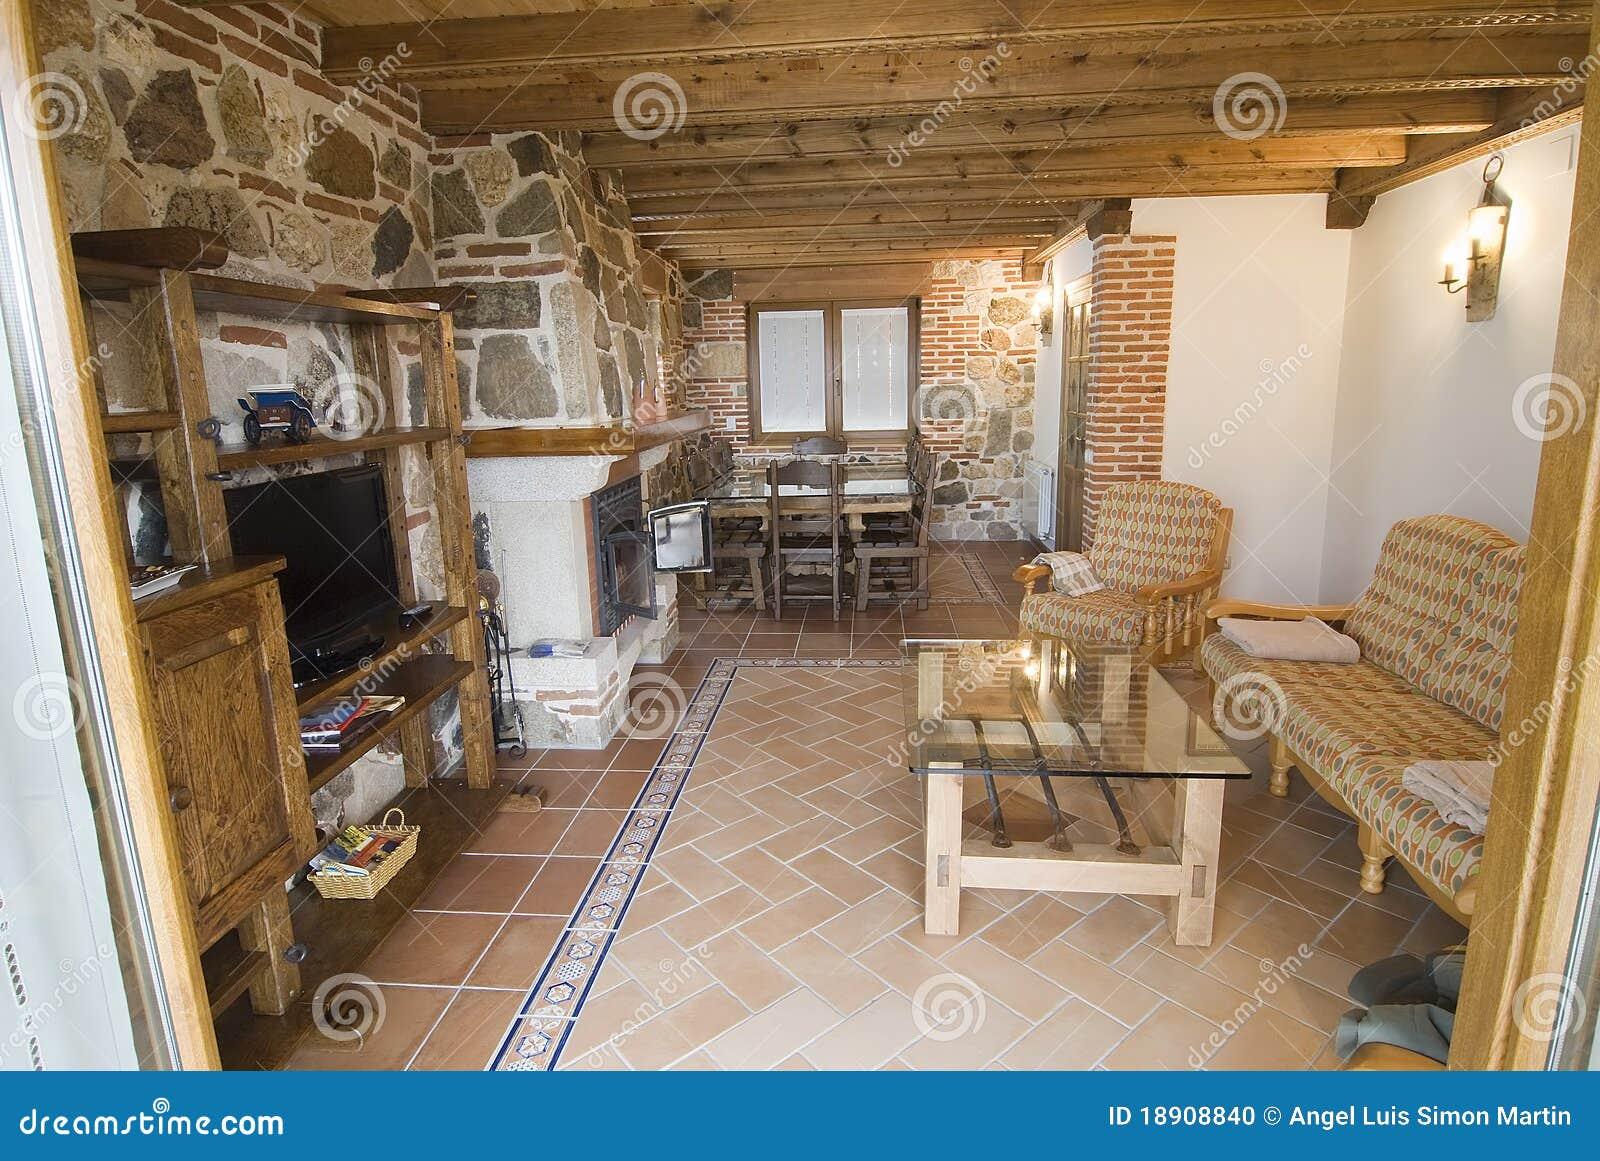 Sala de estar r stica foto de archivo imagen 18908840 for Sala de estar rustica